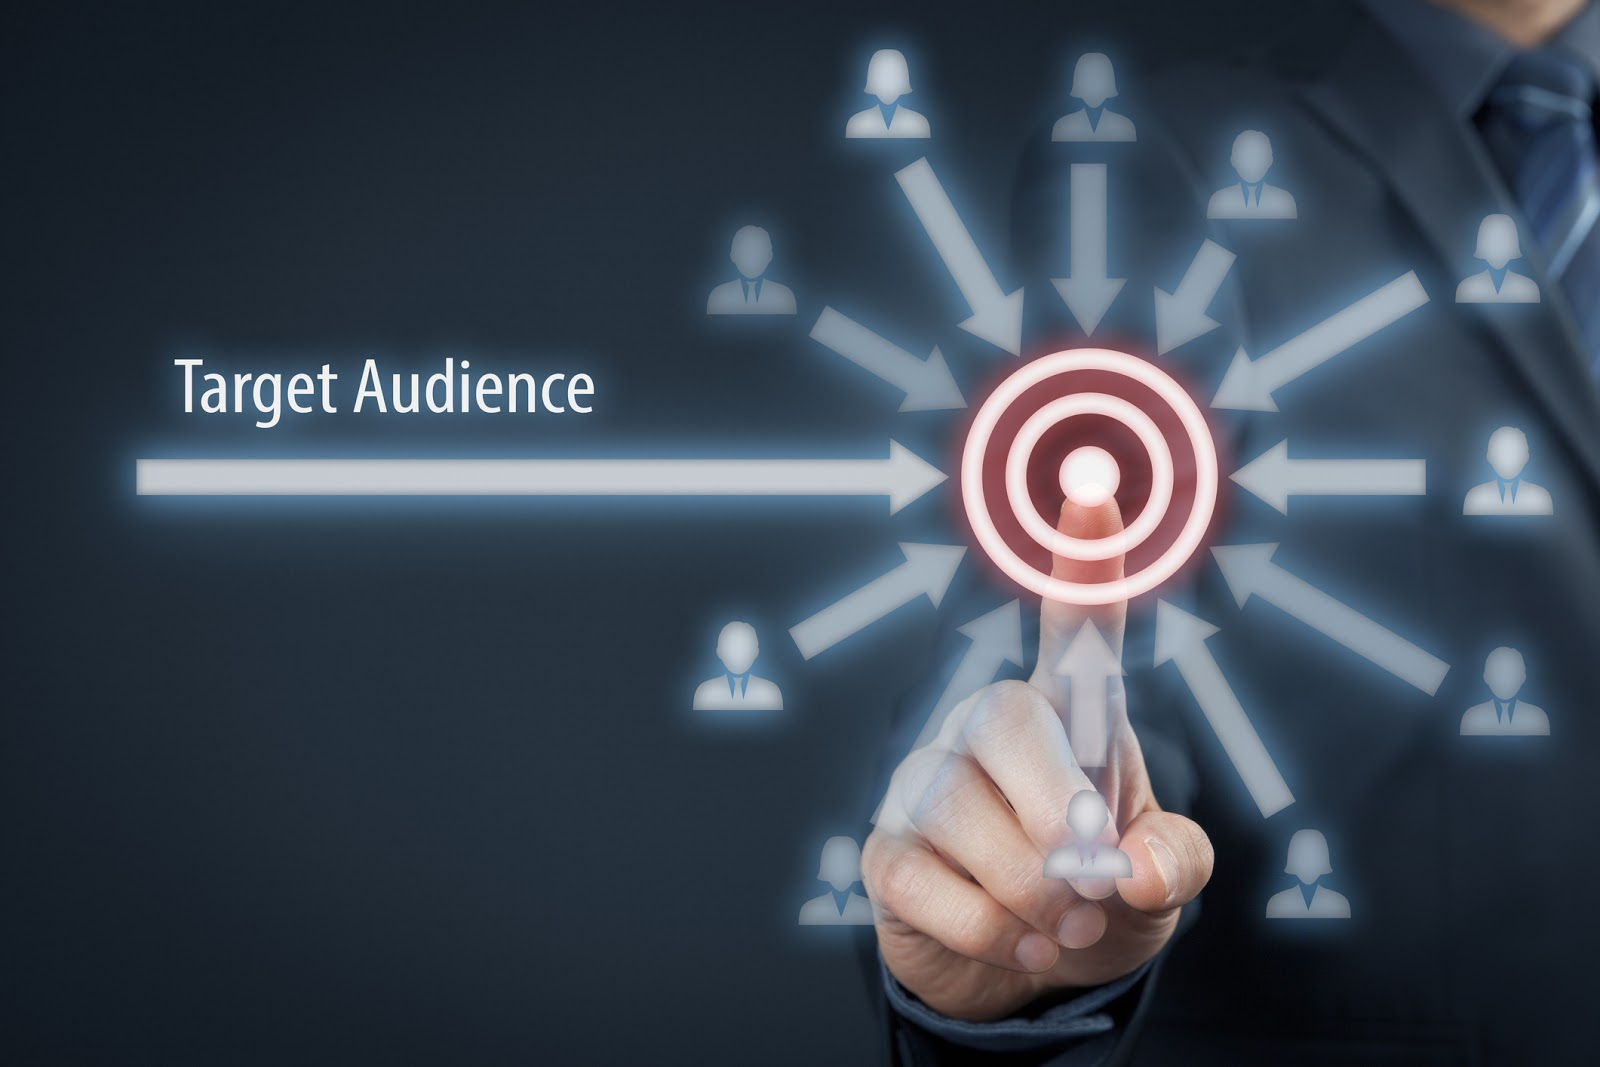 words target audience with bullseye